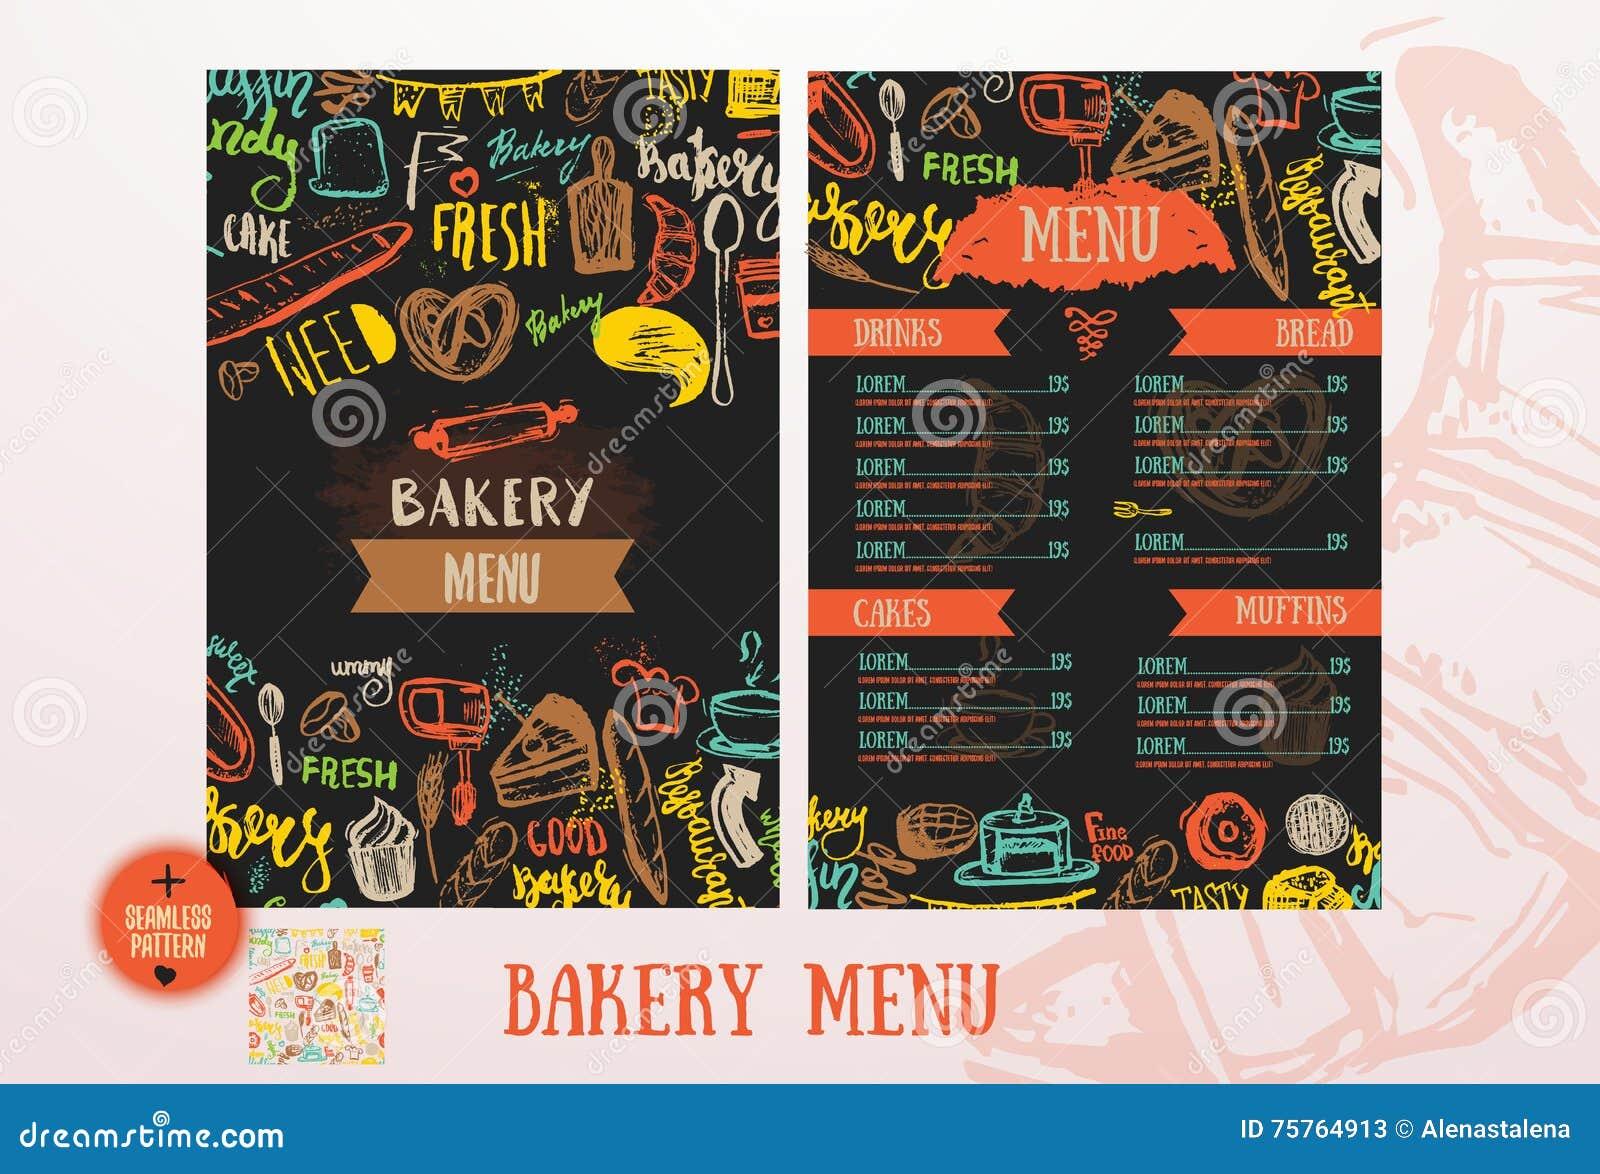 Bakery Cafe Menu Design Template Stock Vector Illustration Of